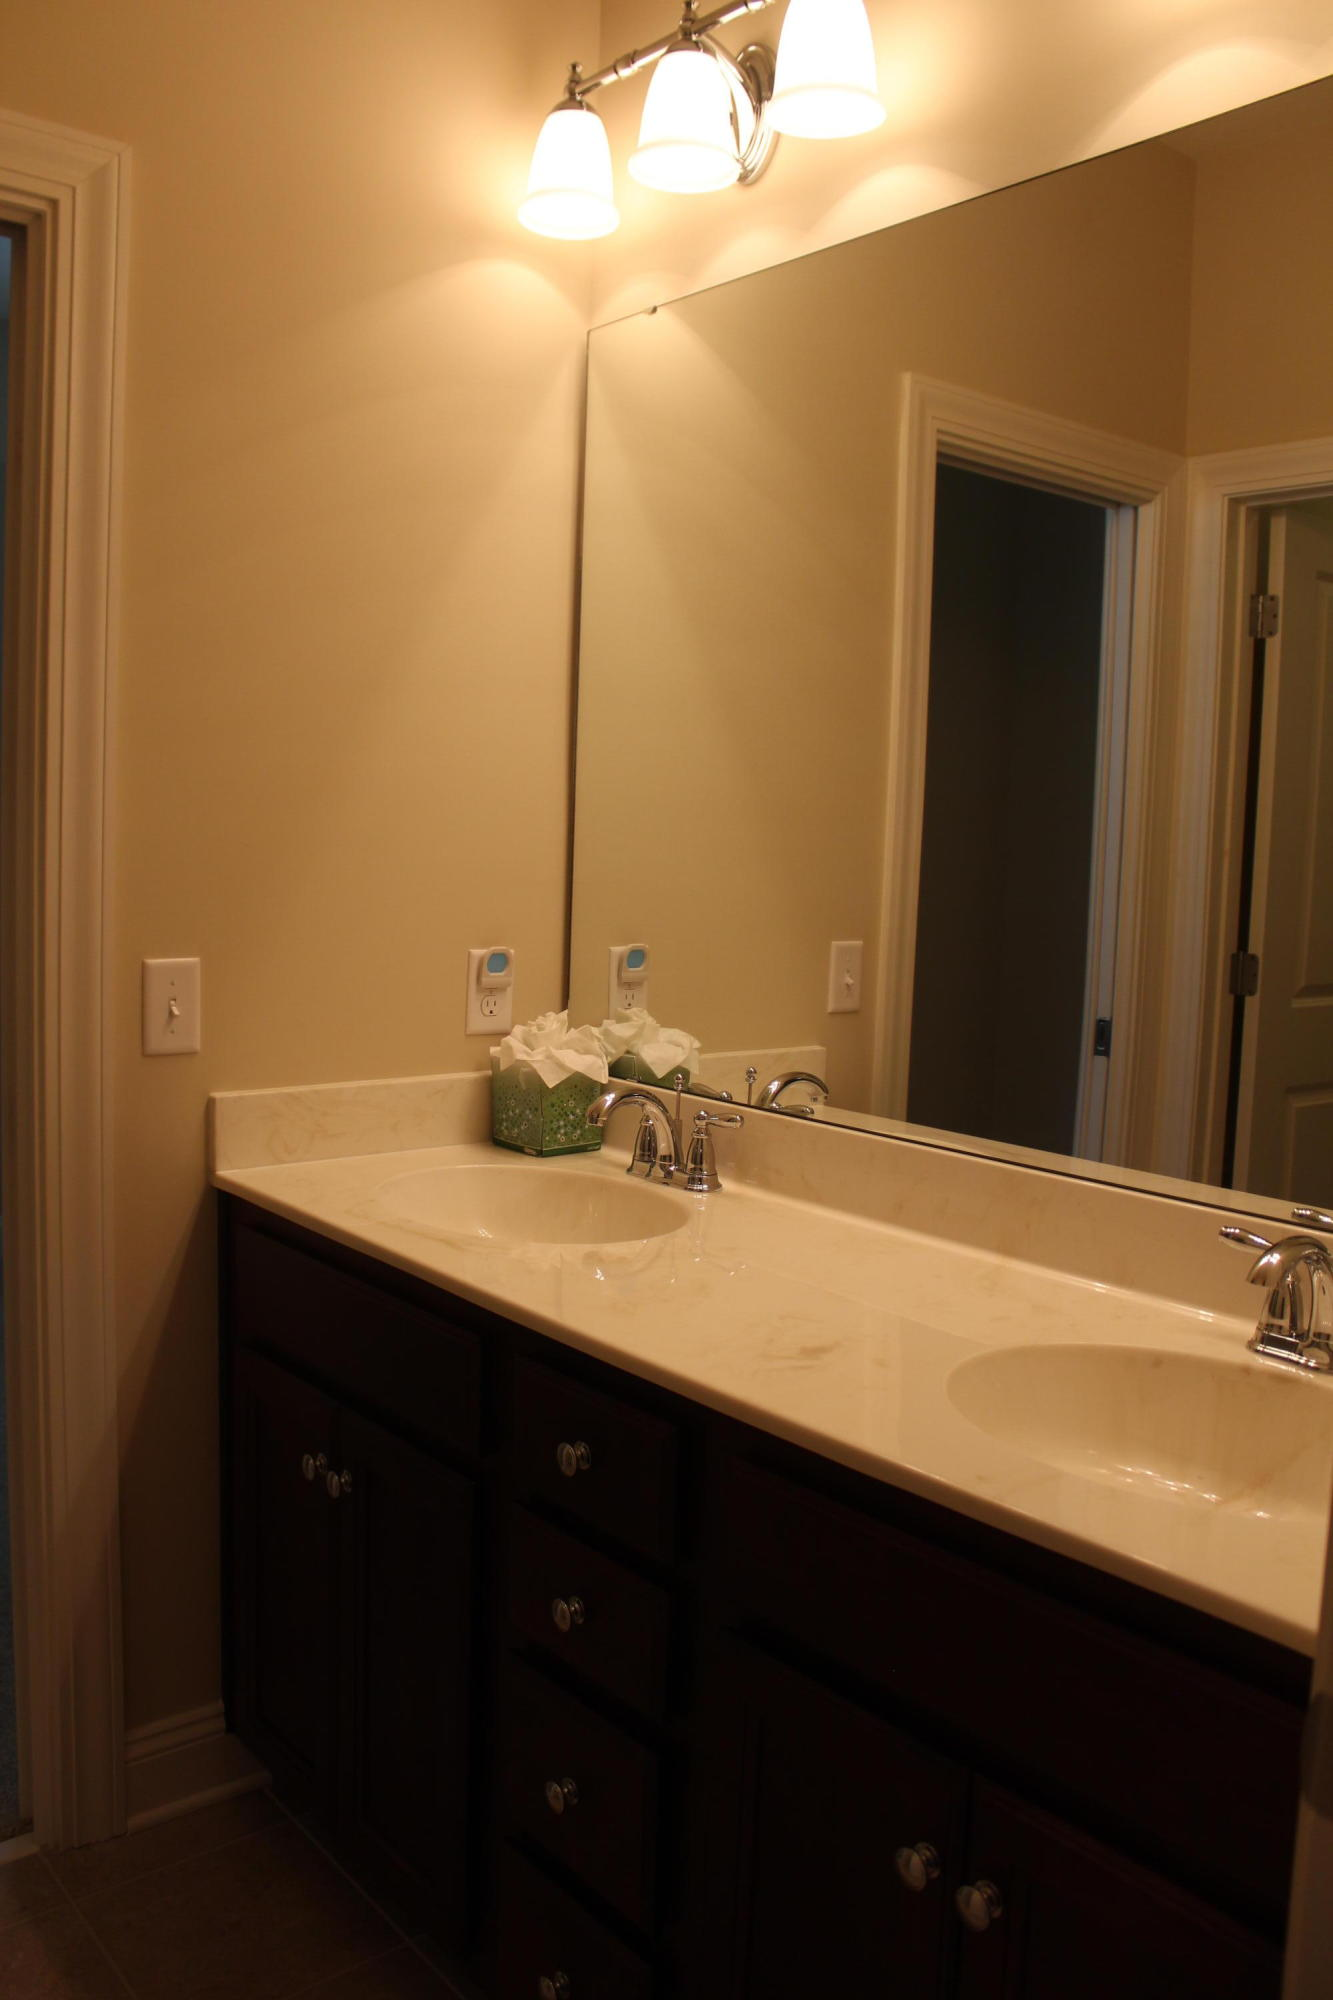 Dunes West Homes For Sale - 1403 Masthead, Mount Pleasant, SC - 10